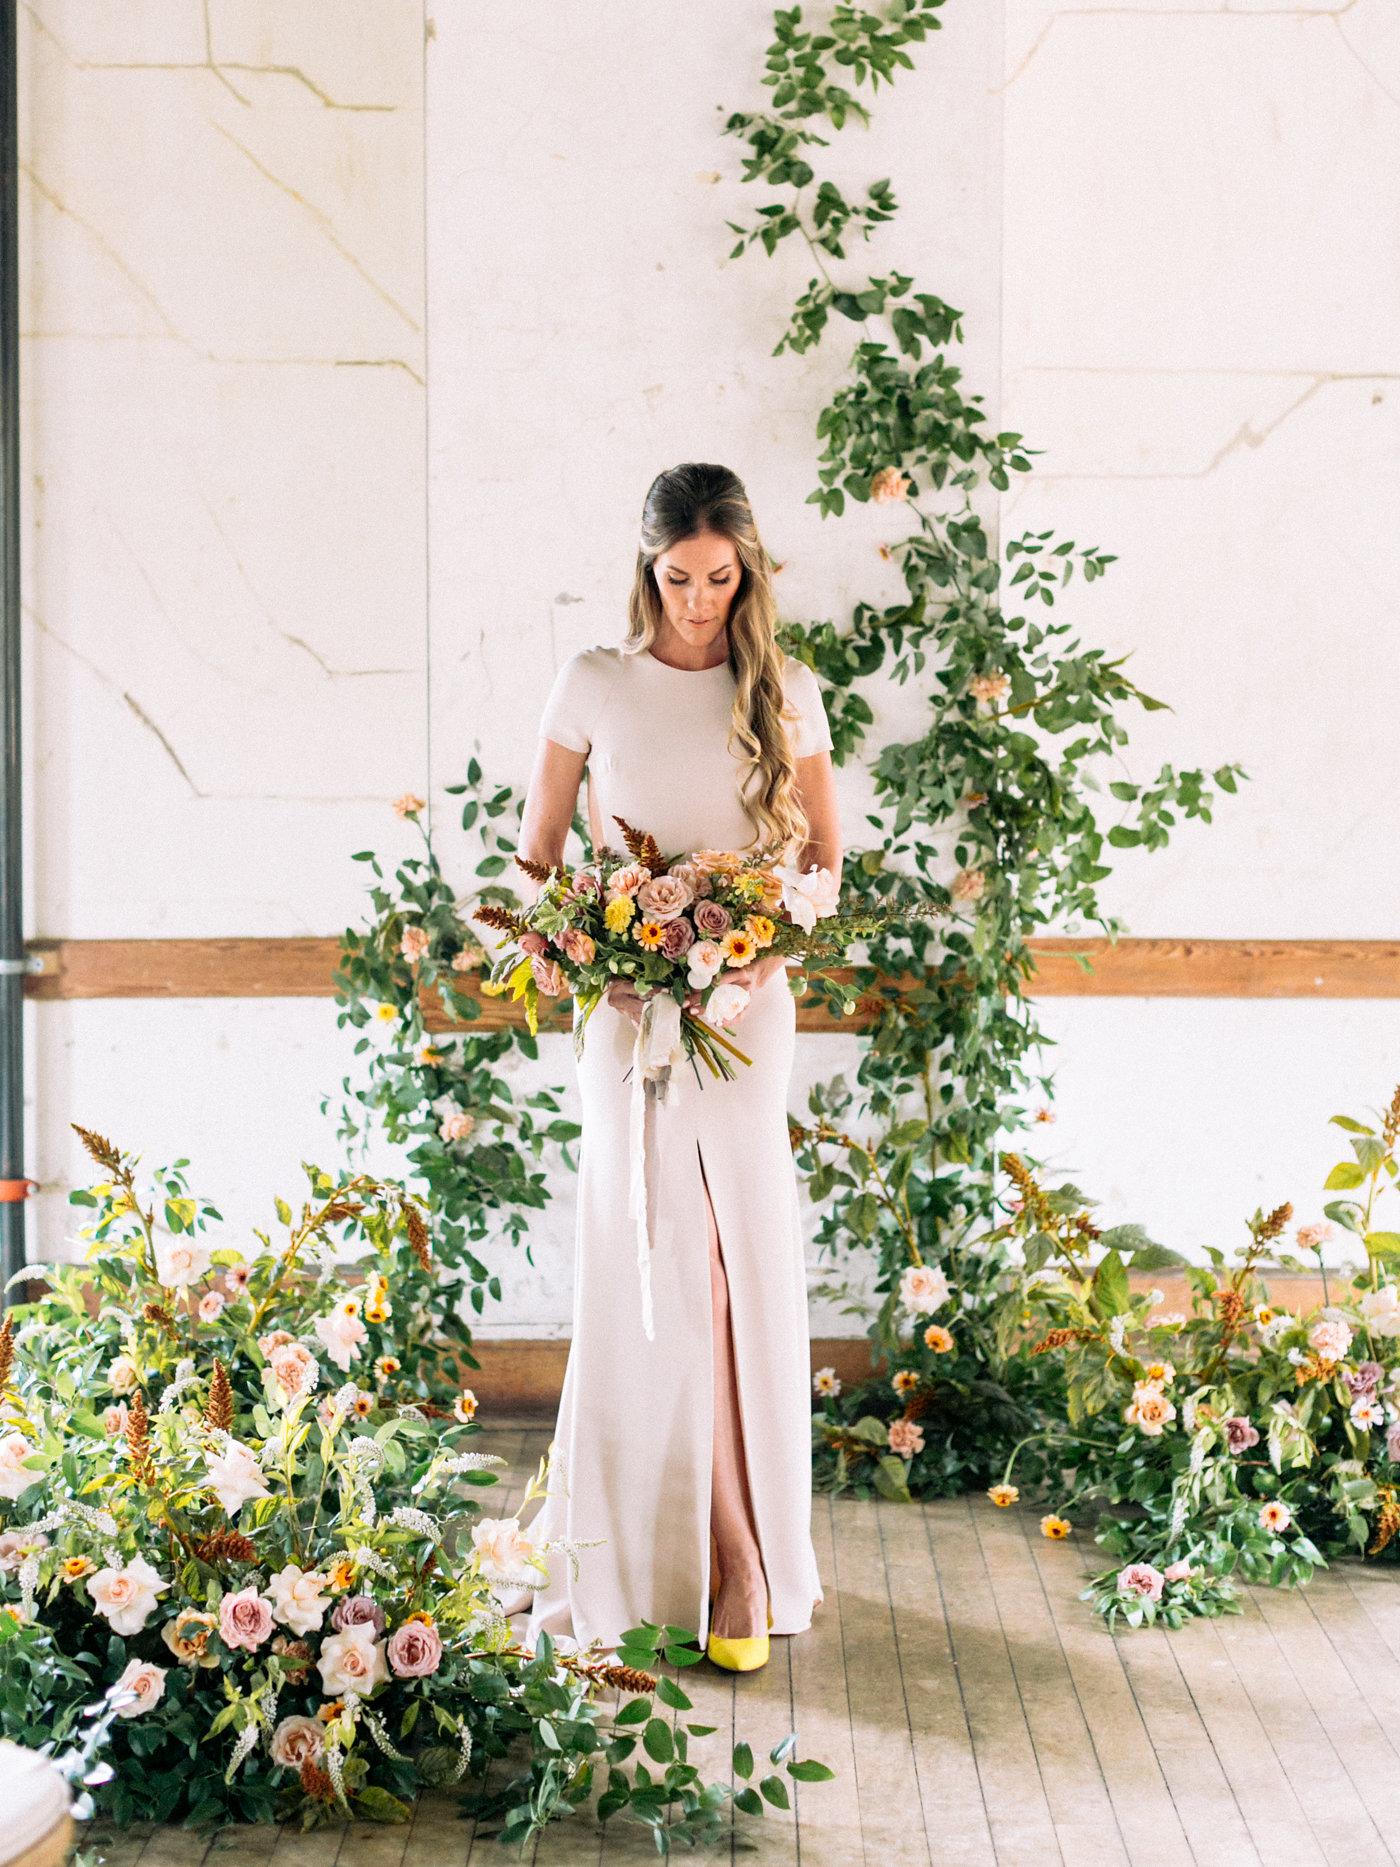 Kir dress by Sarah Seven